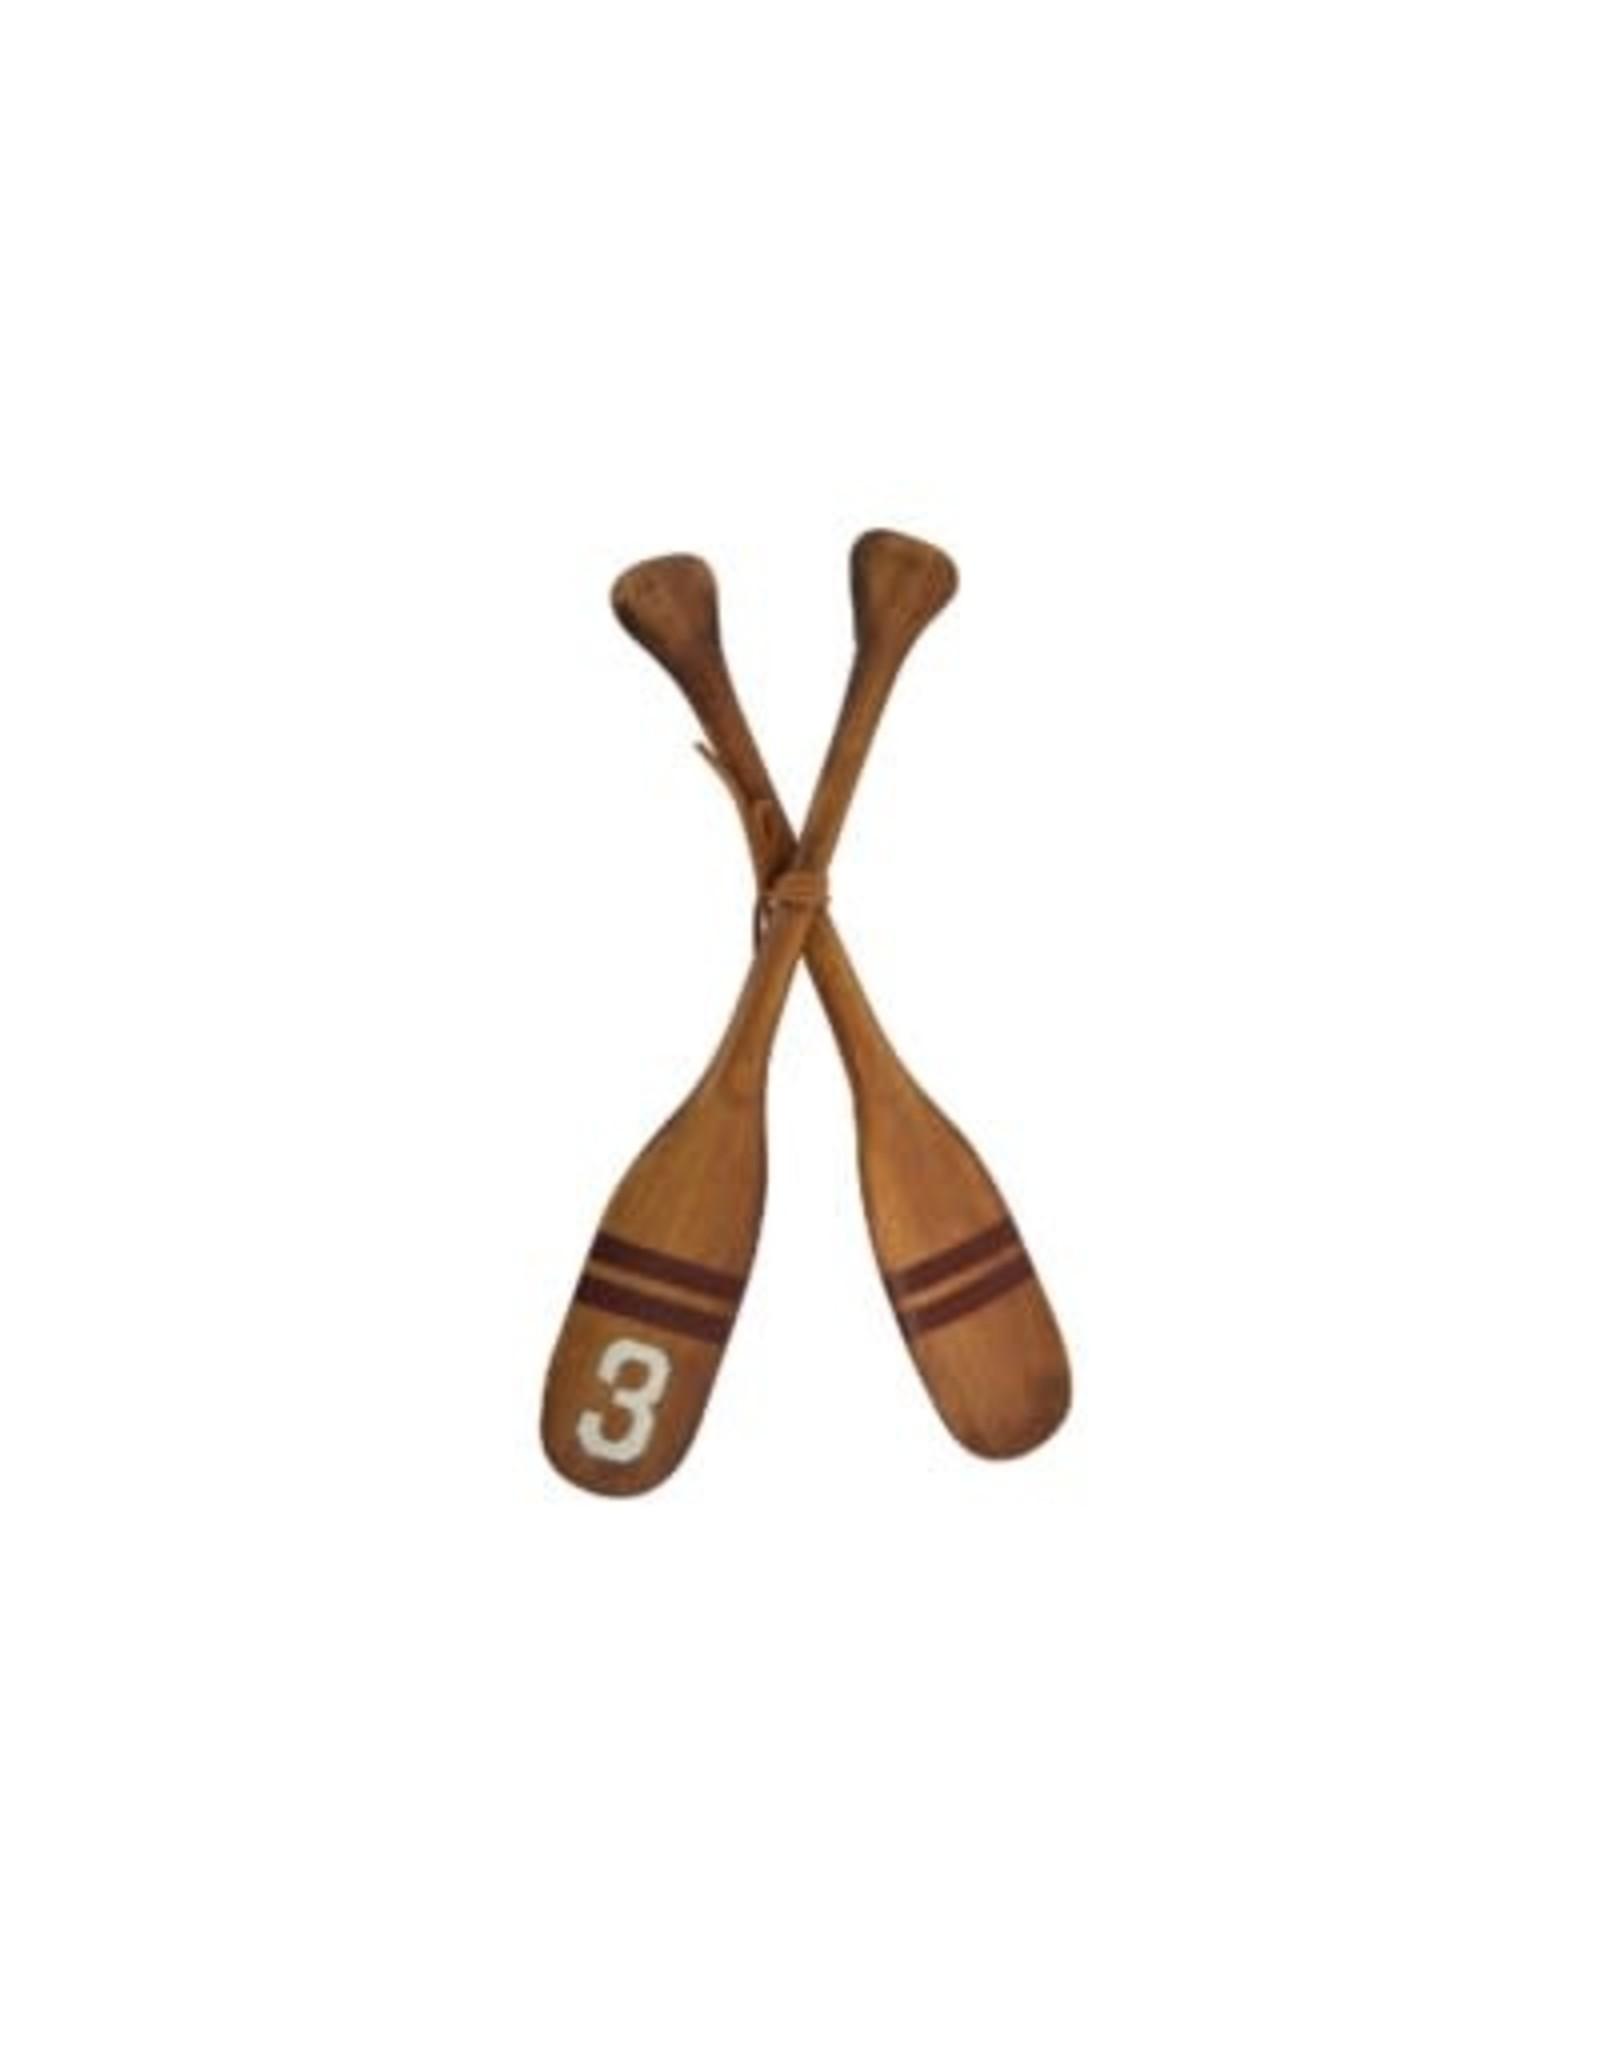 Rames NO.3 en bois